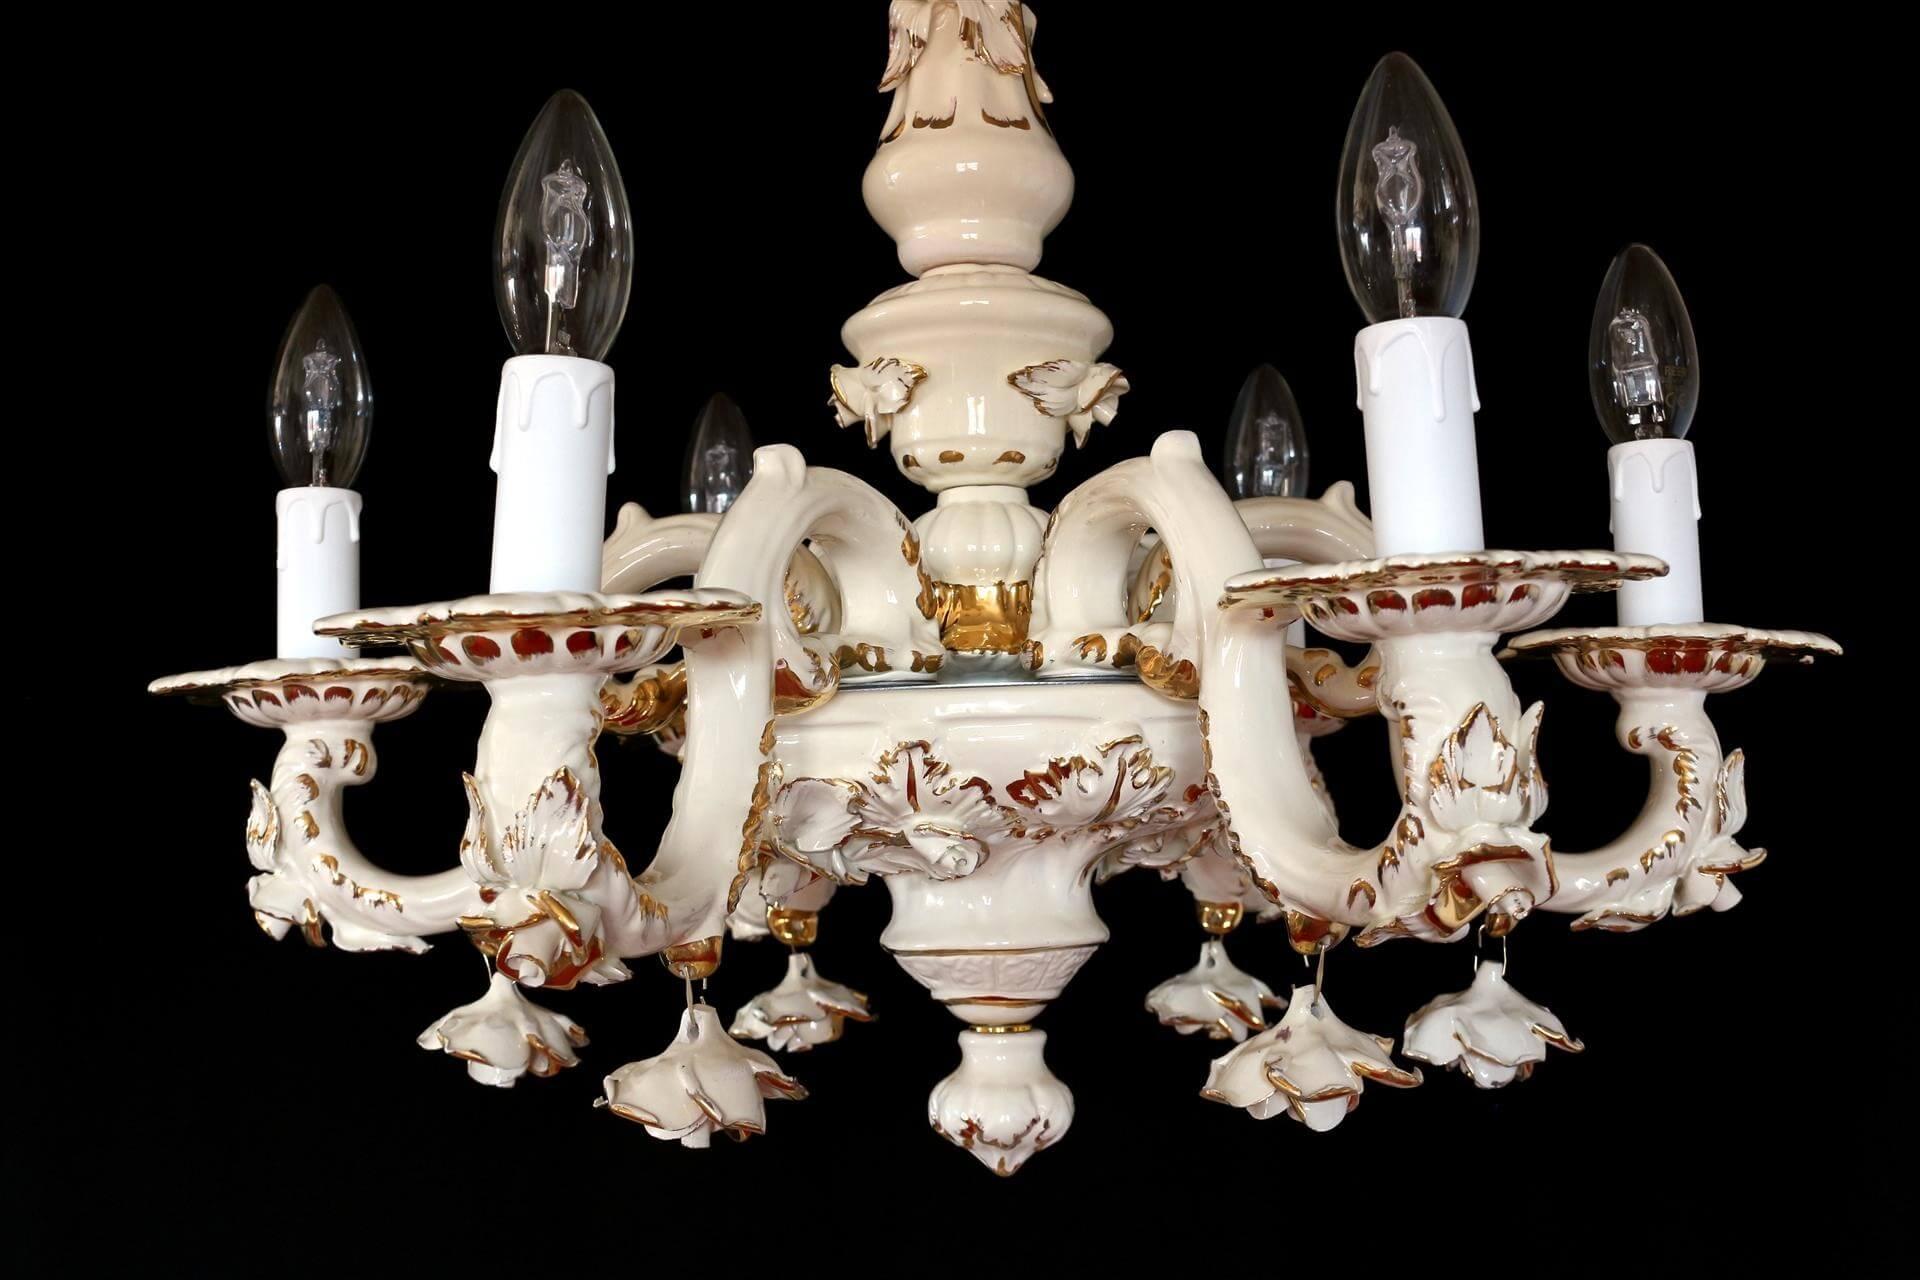 Lampadario Ceramica Di Bassano.Lampadario A Sei Luci In Ceramica